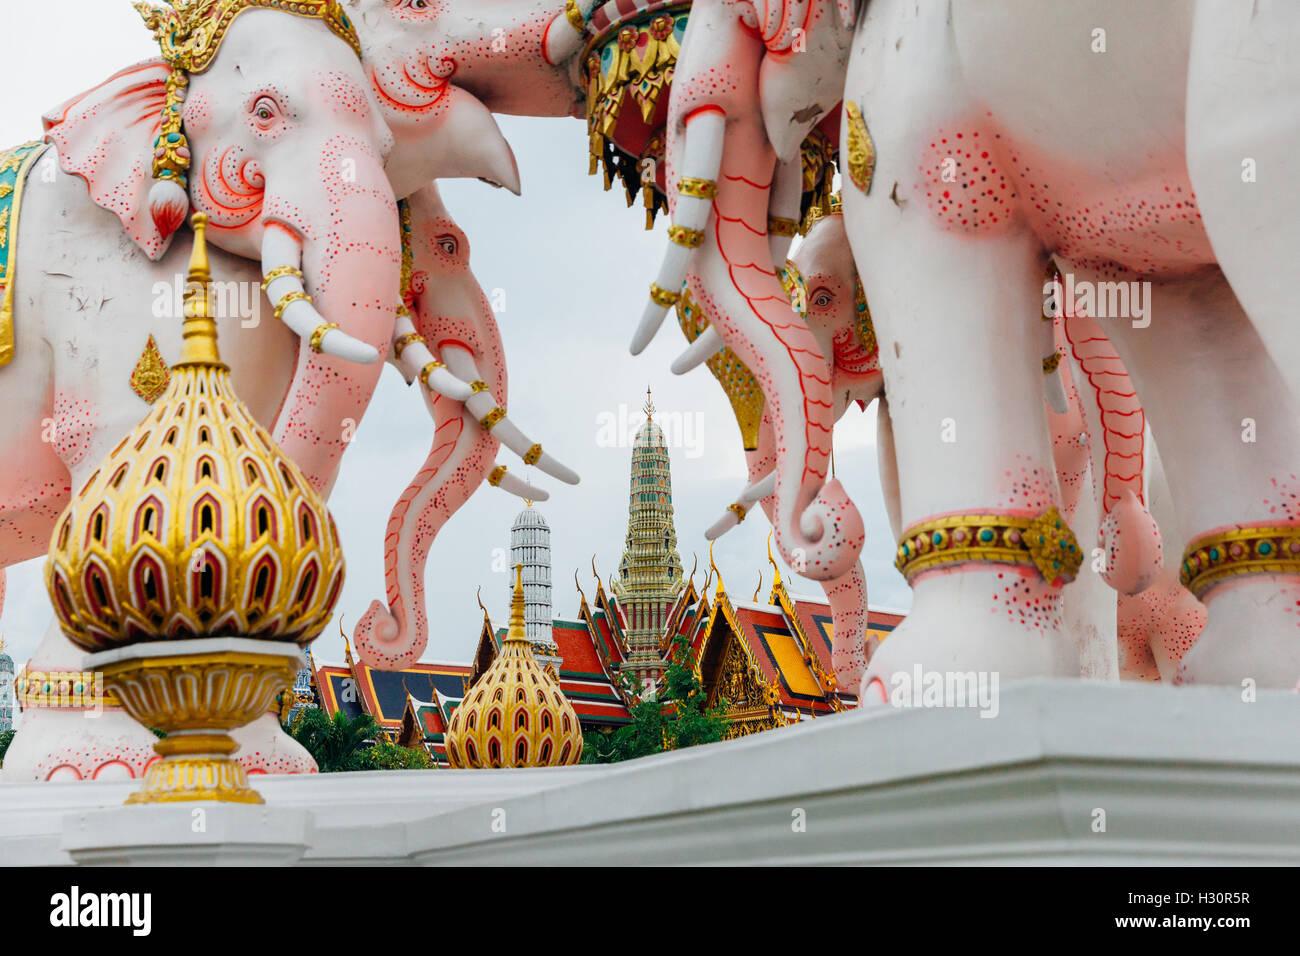 Grand Palace seen through the Pink Elephant Statue, Bangkok, Thailand - Stock Image